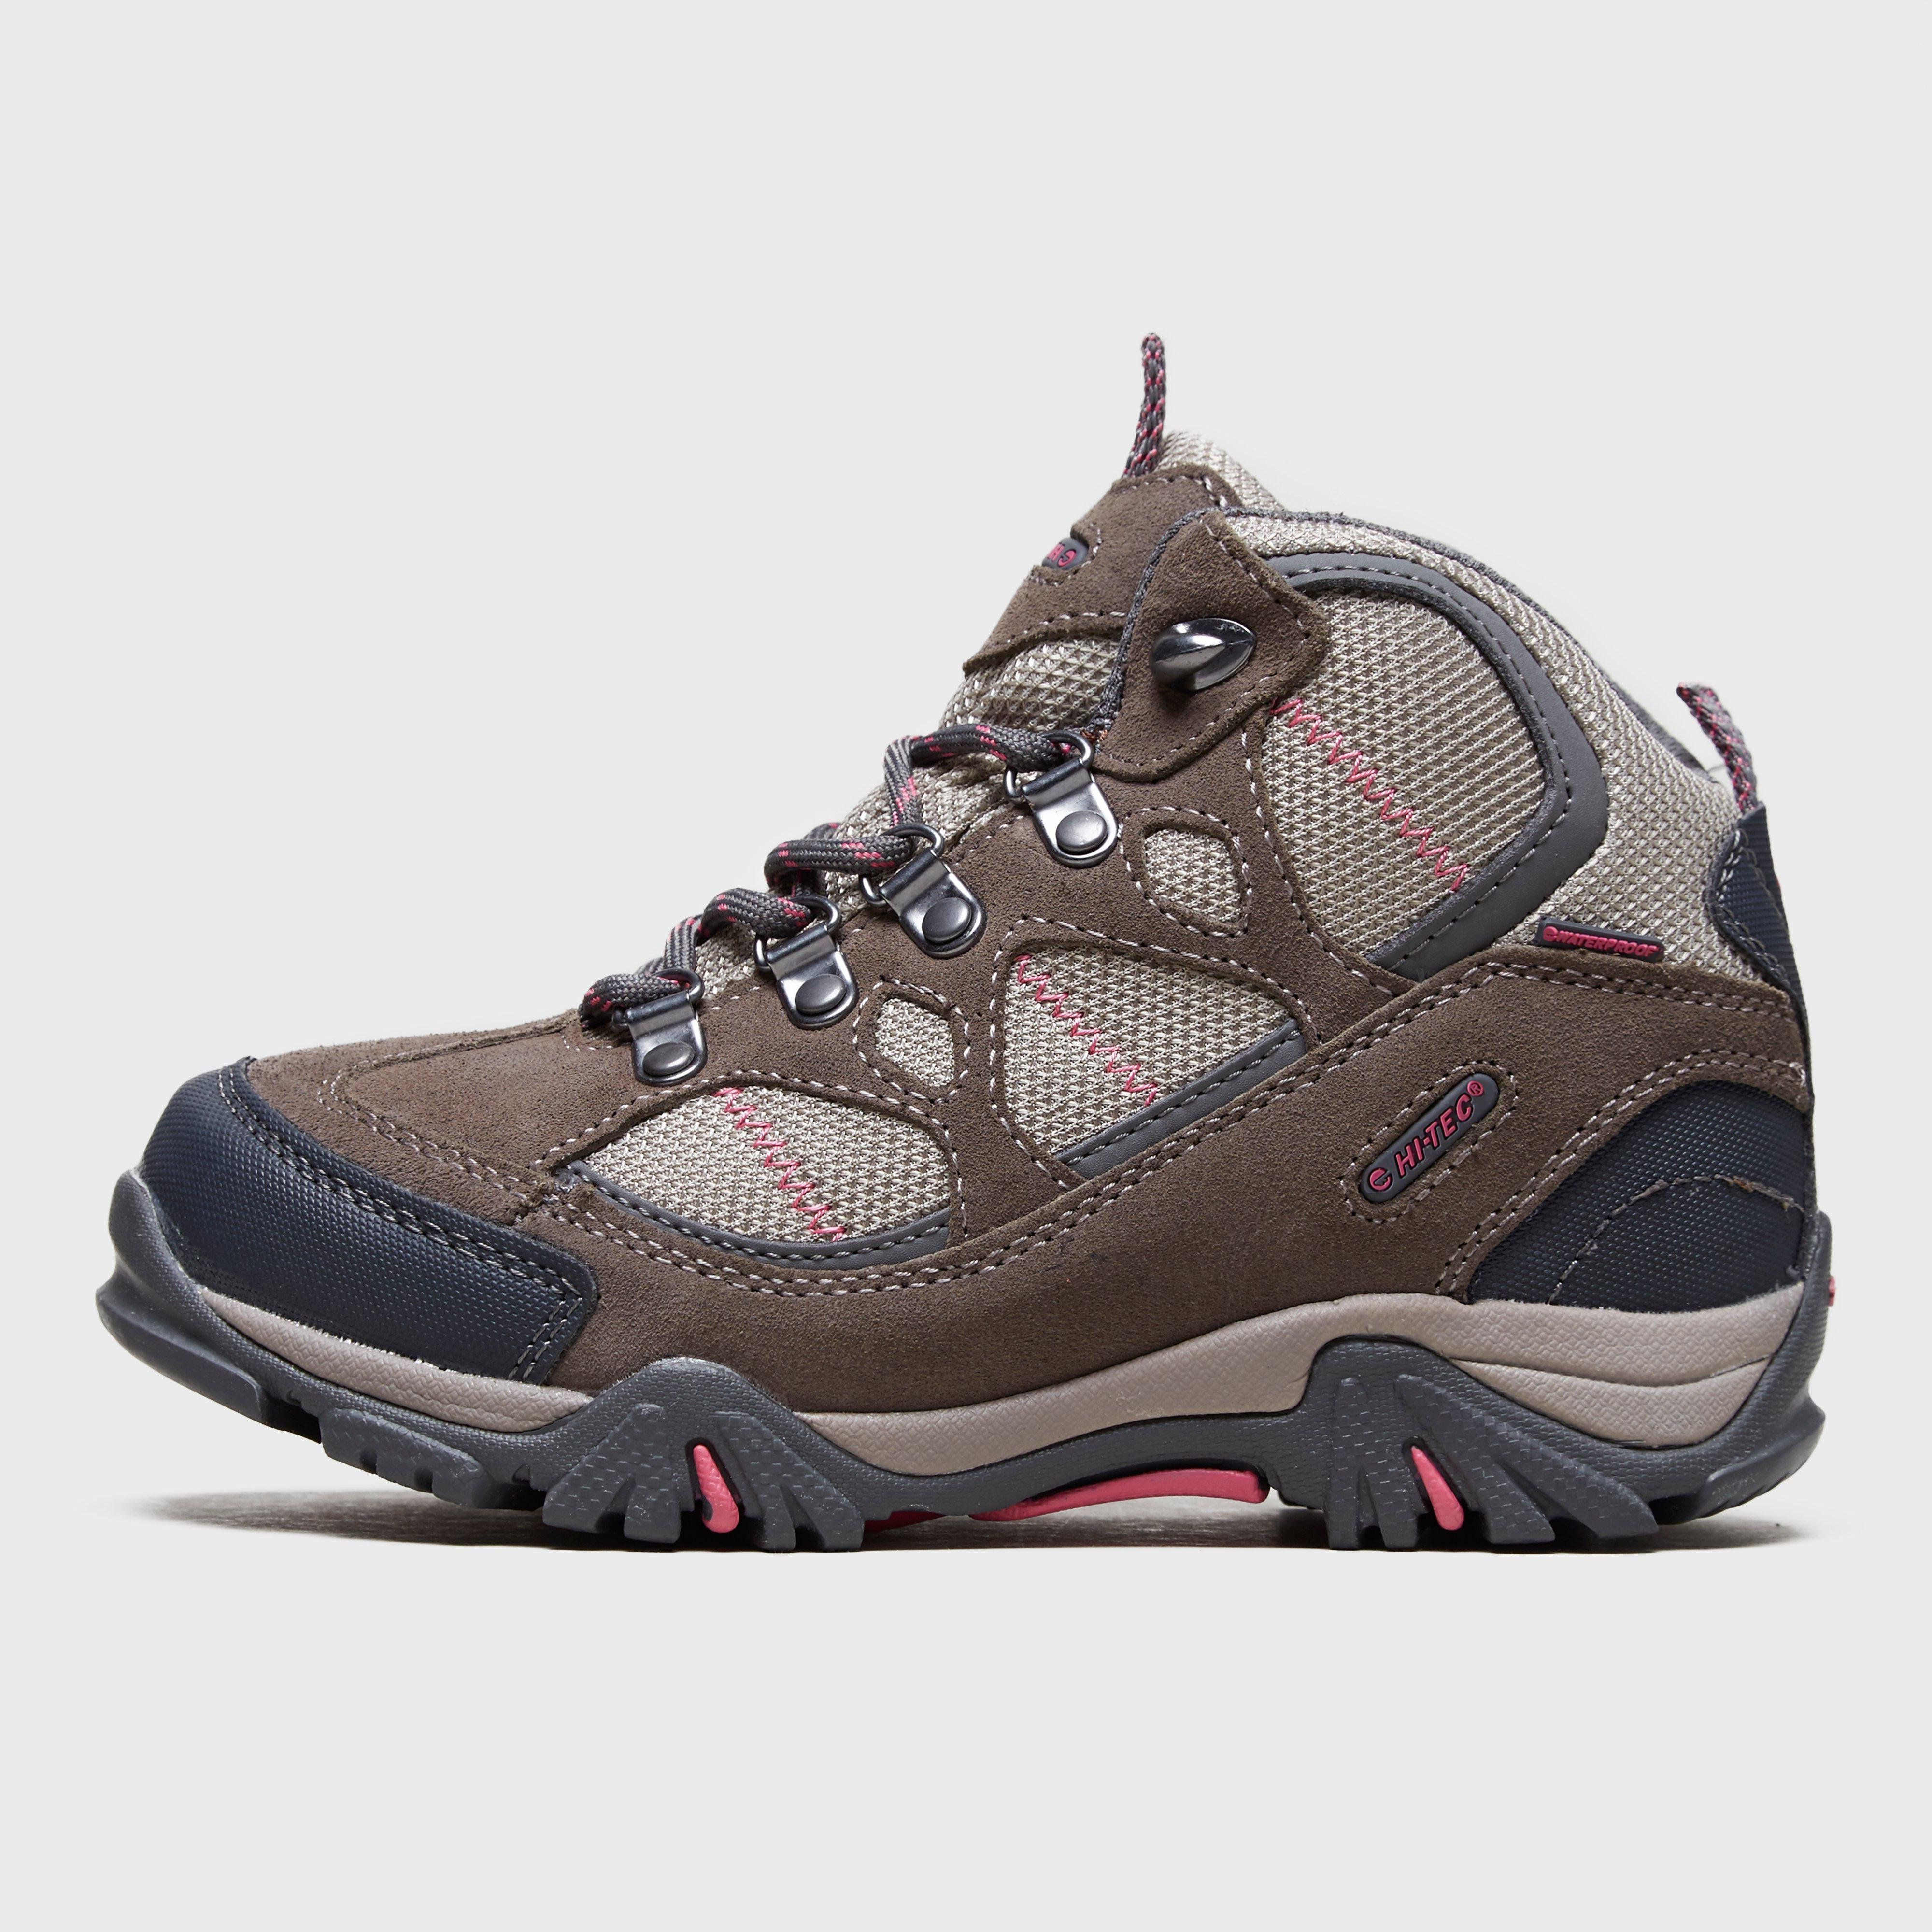 HI TEC Girl's Renegade Walking Boots